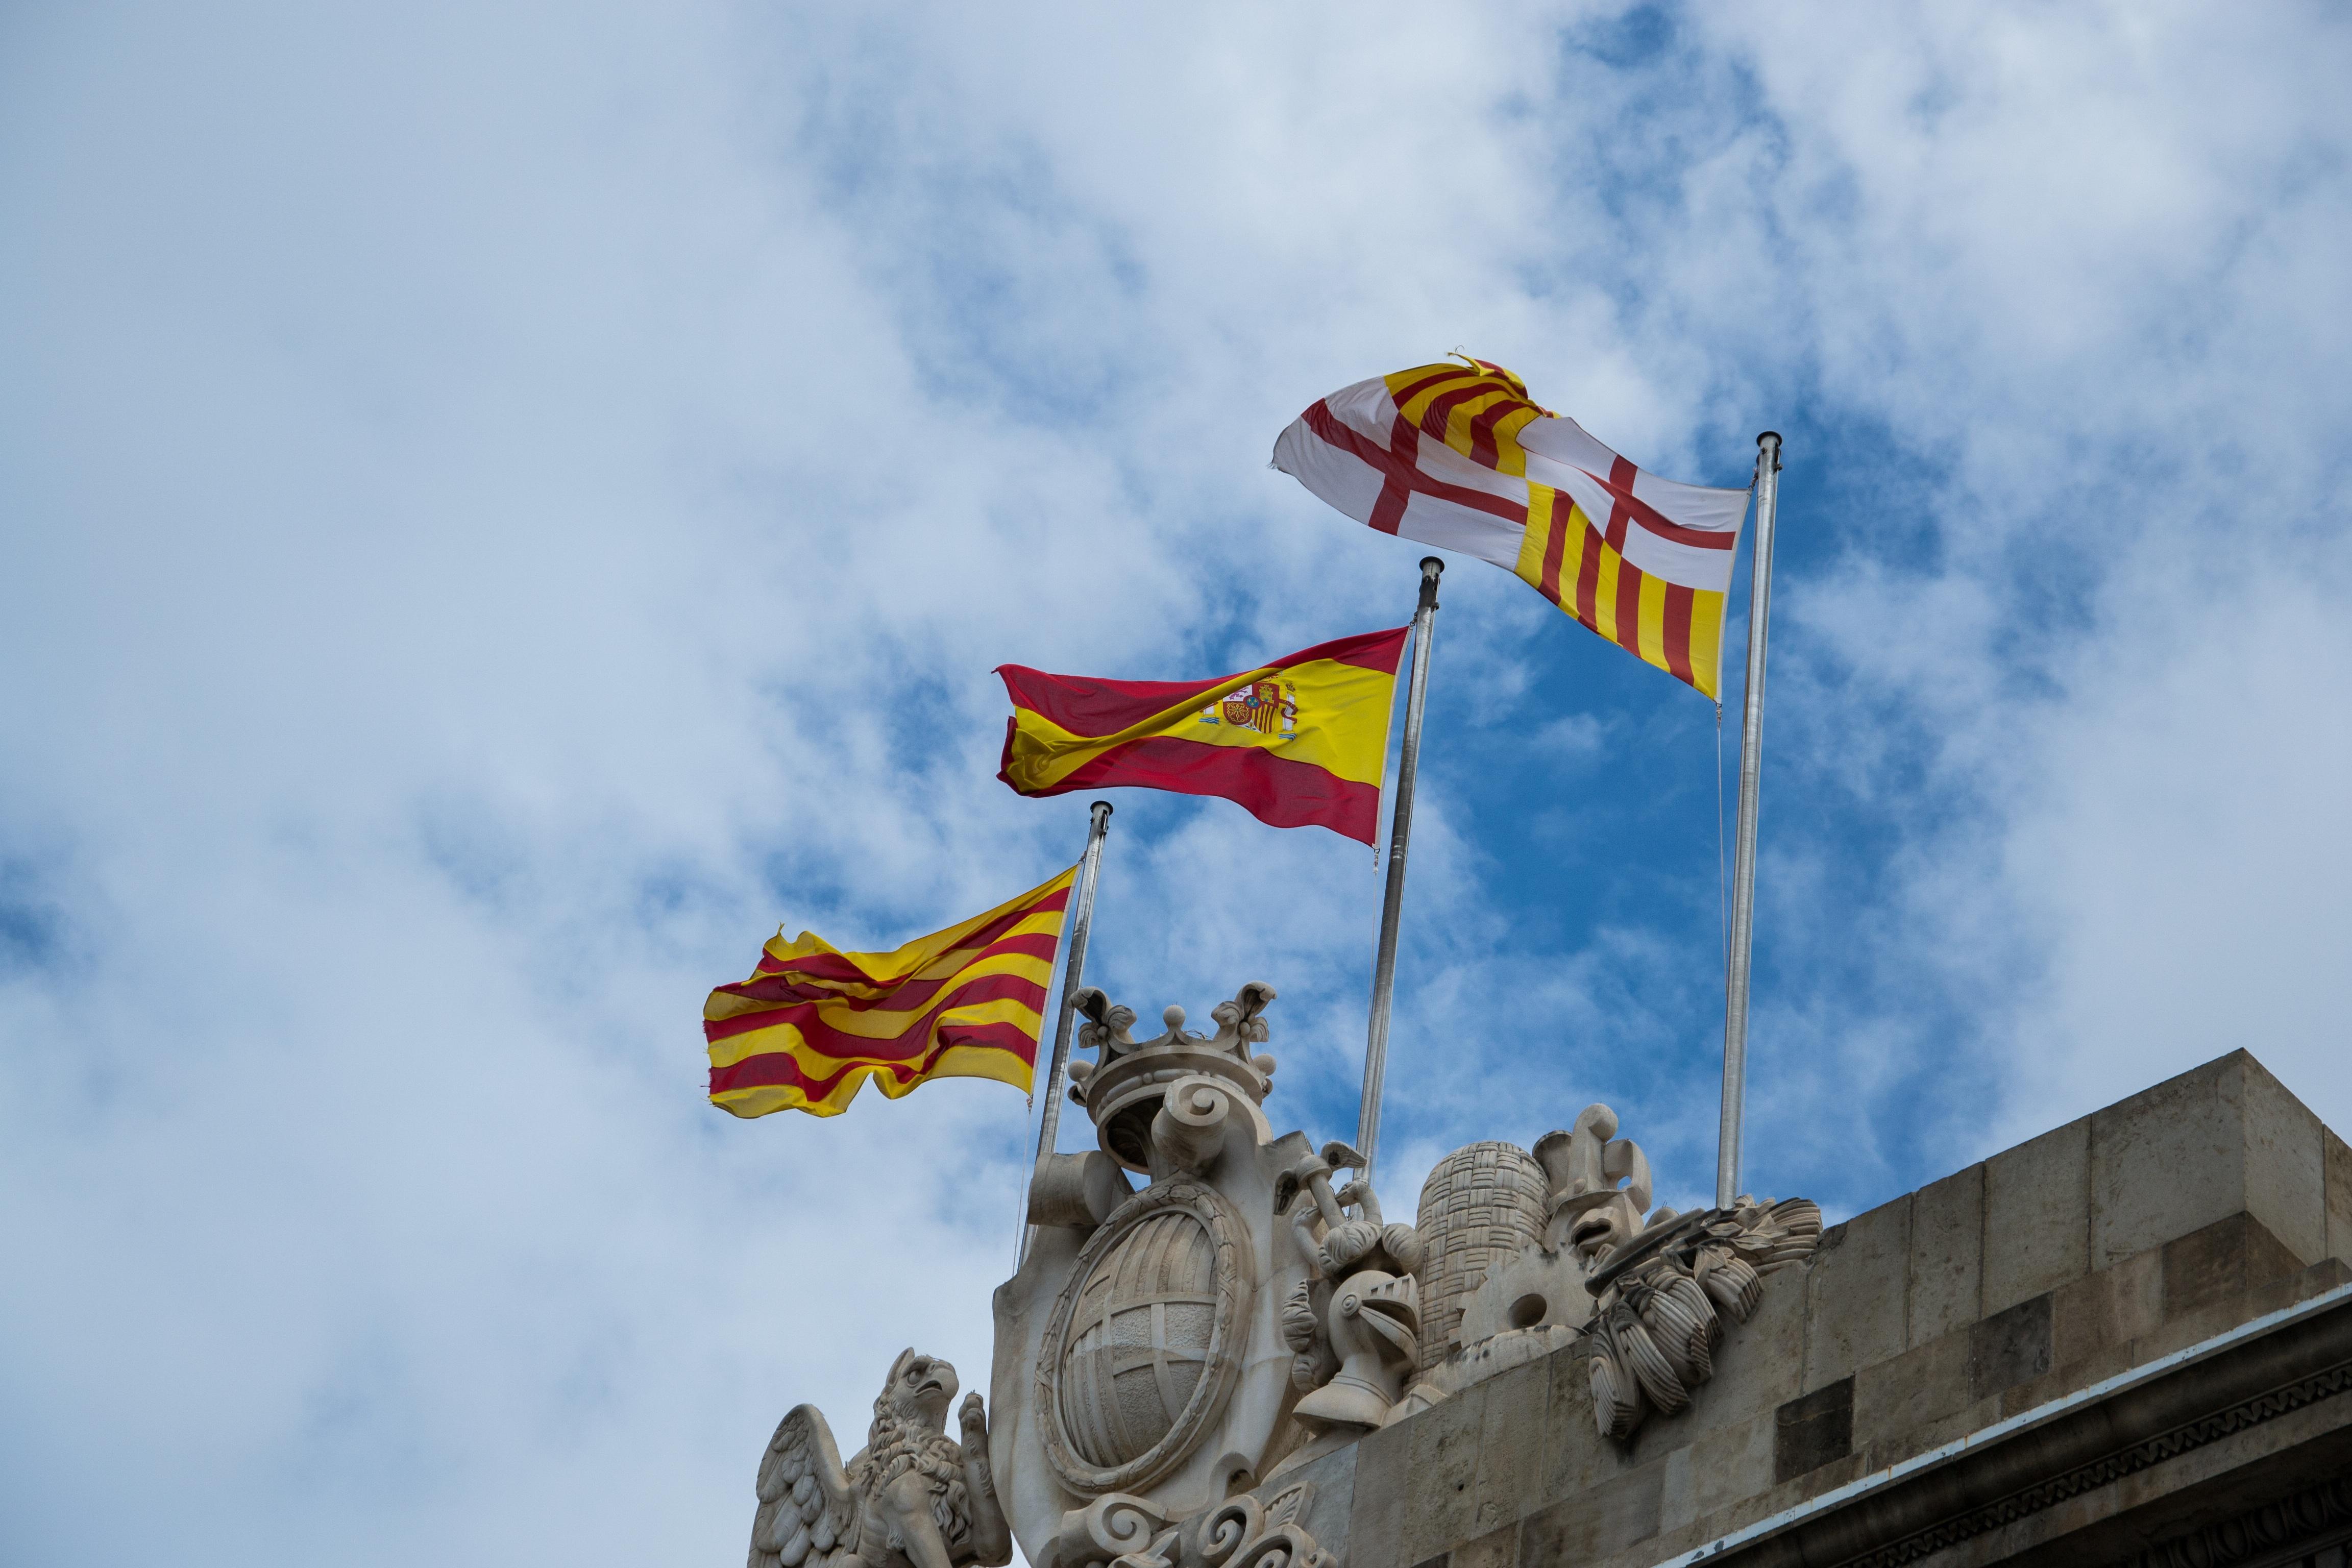 free images sky wind flag blue barcelona spain flags